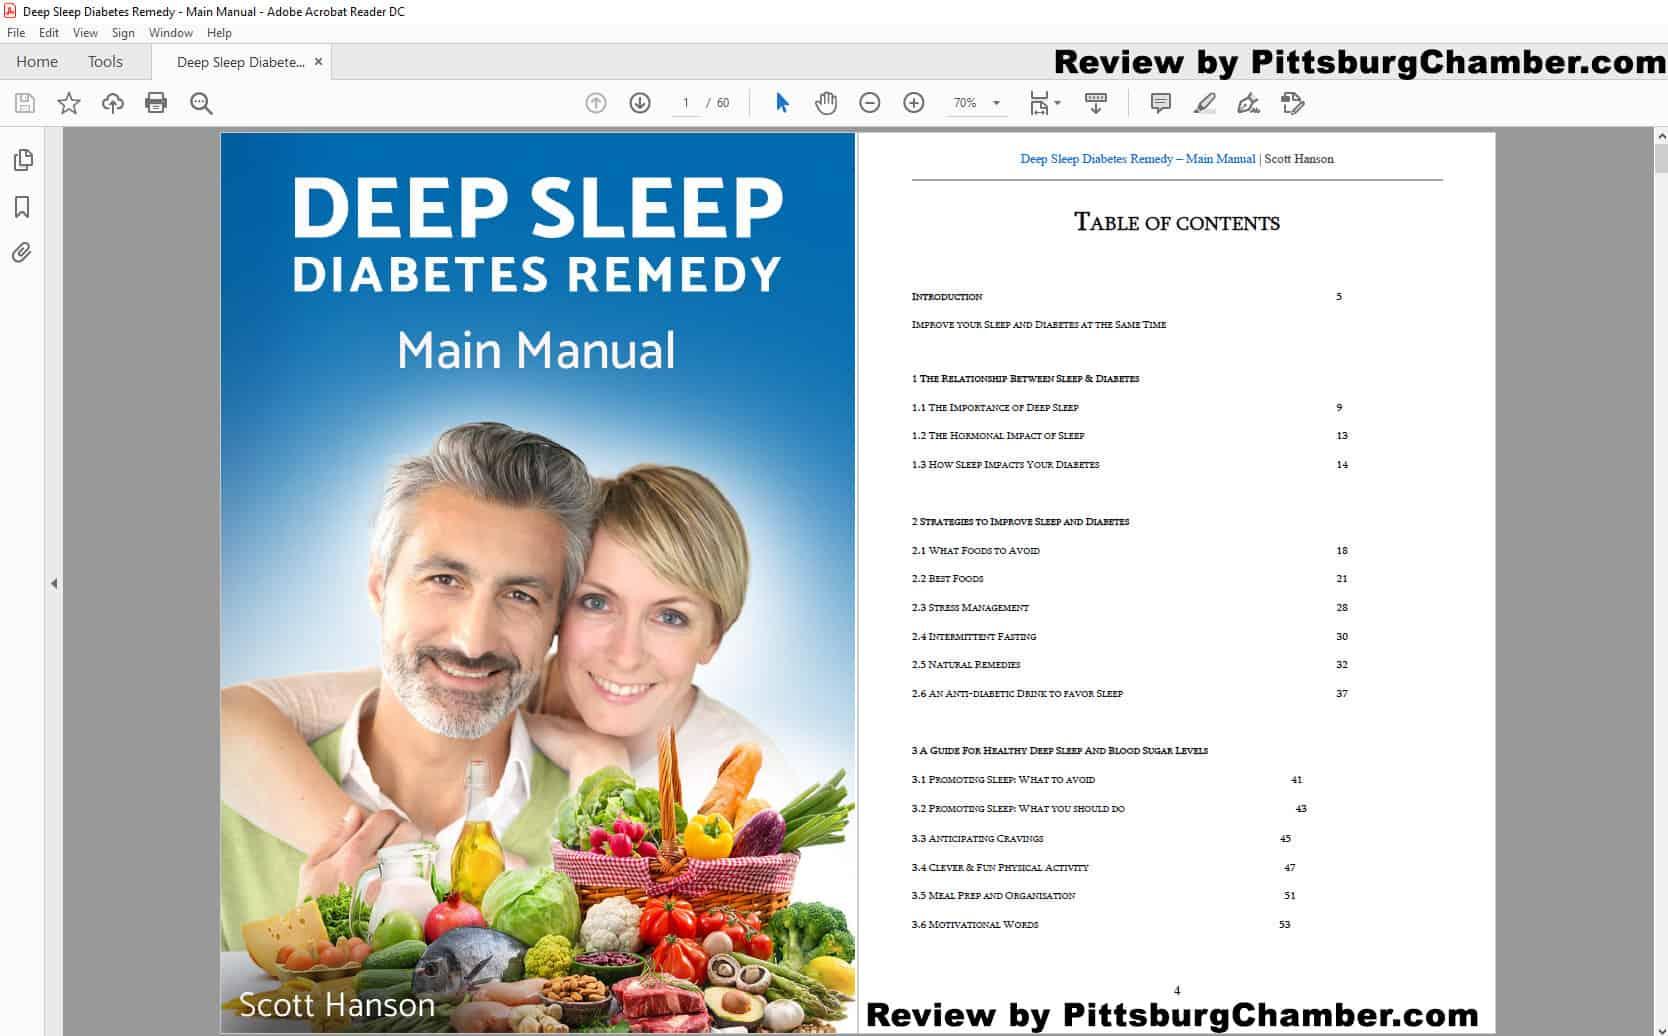 Deep Sleep Diabetes Remedy Table of Contents